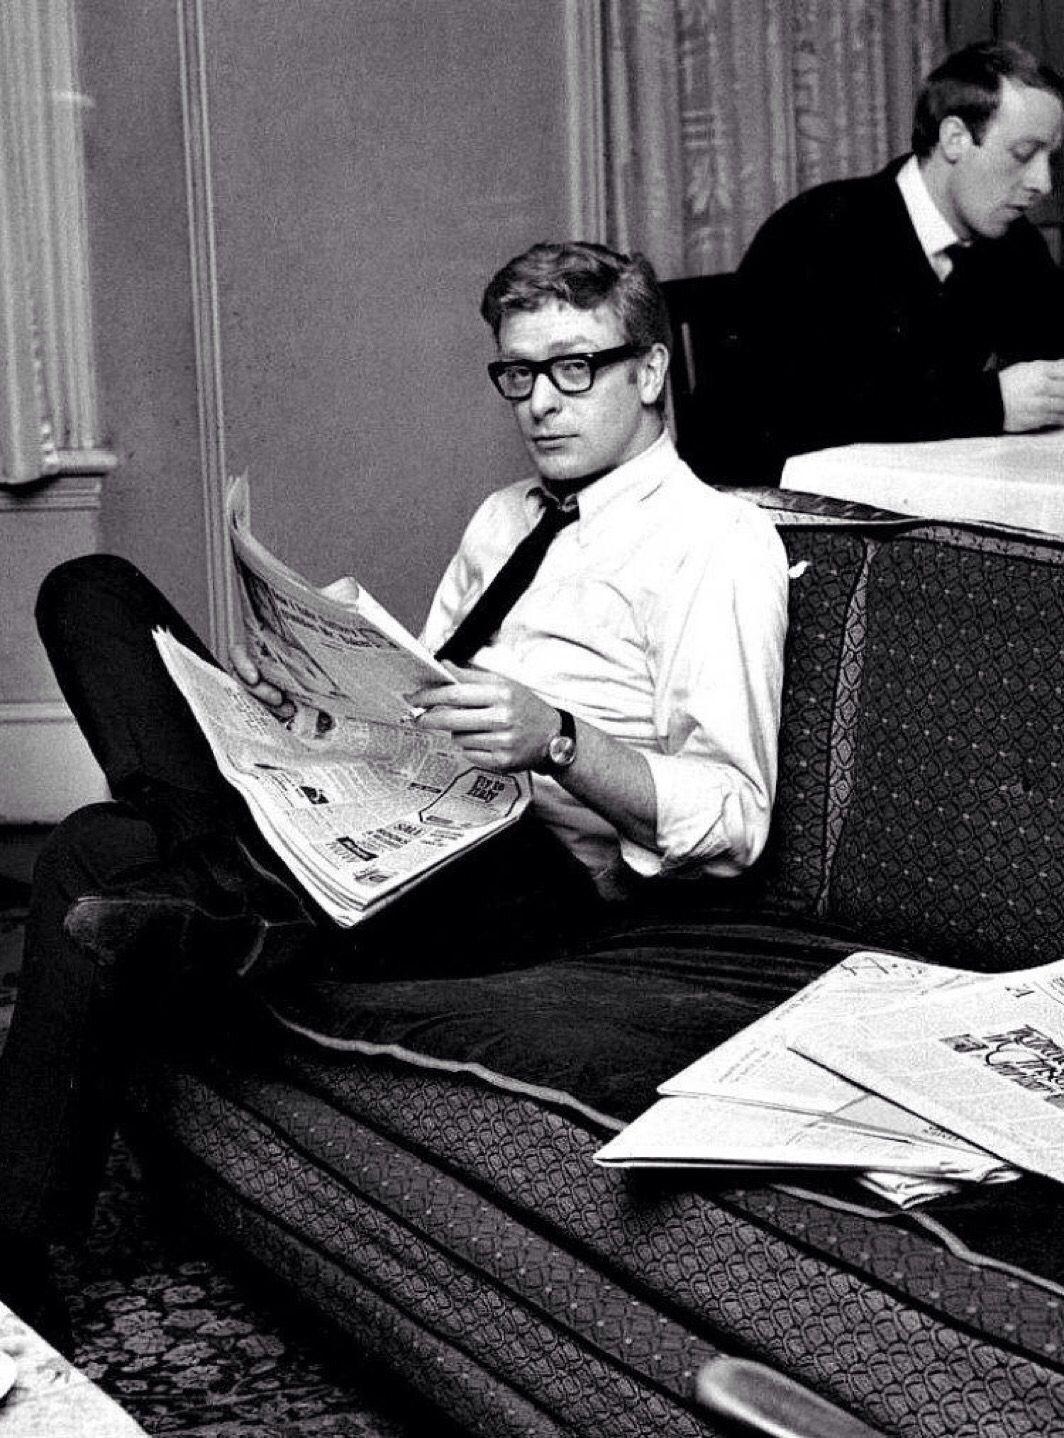 Michael Caine, 1959